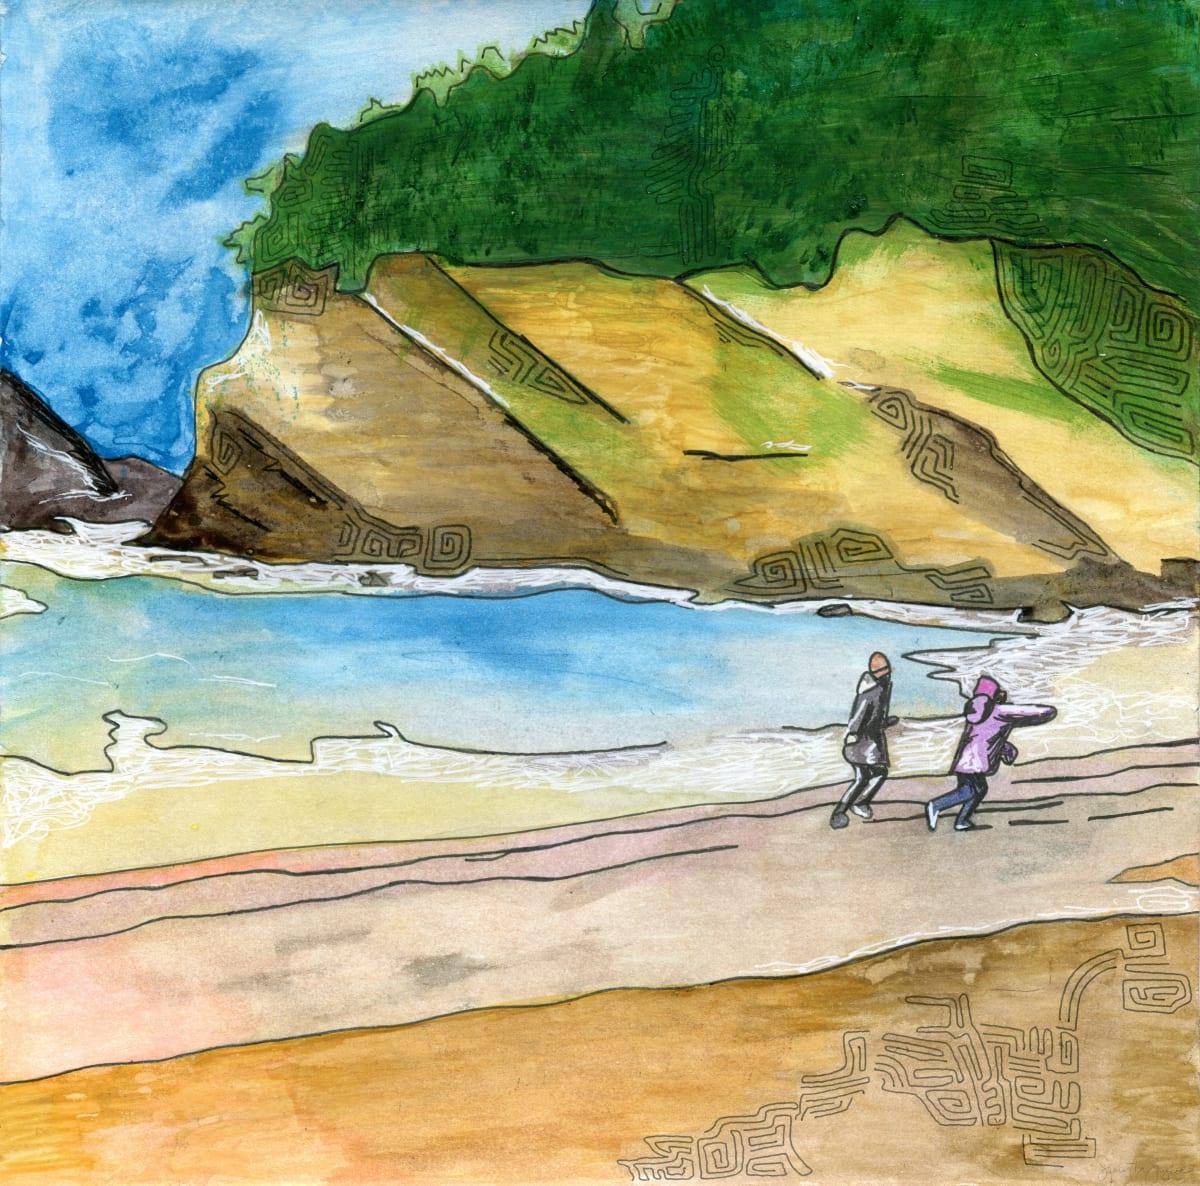 Running on the Beach by Samantha Snyder